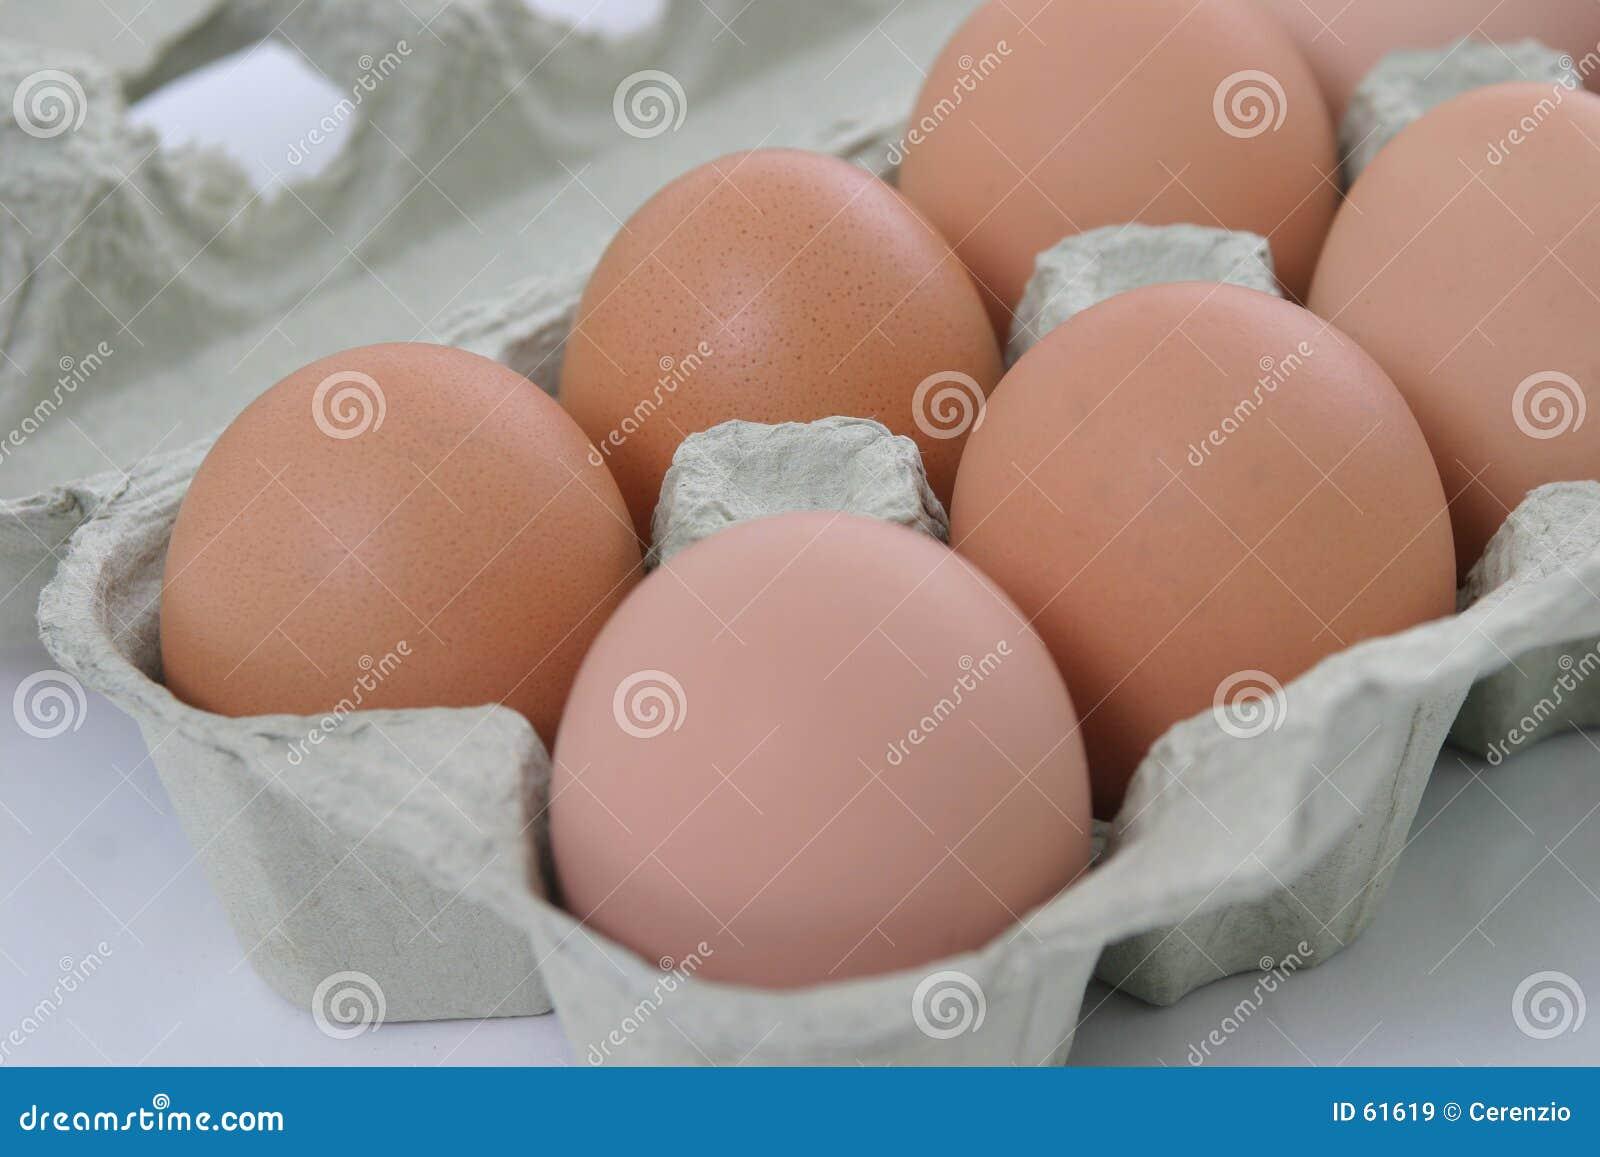 Pół tuzin jaj